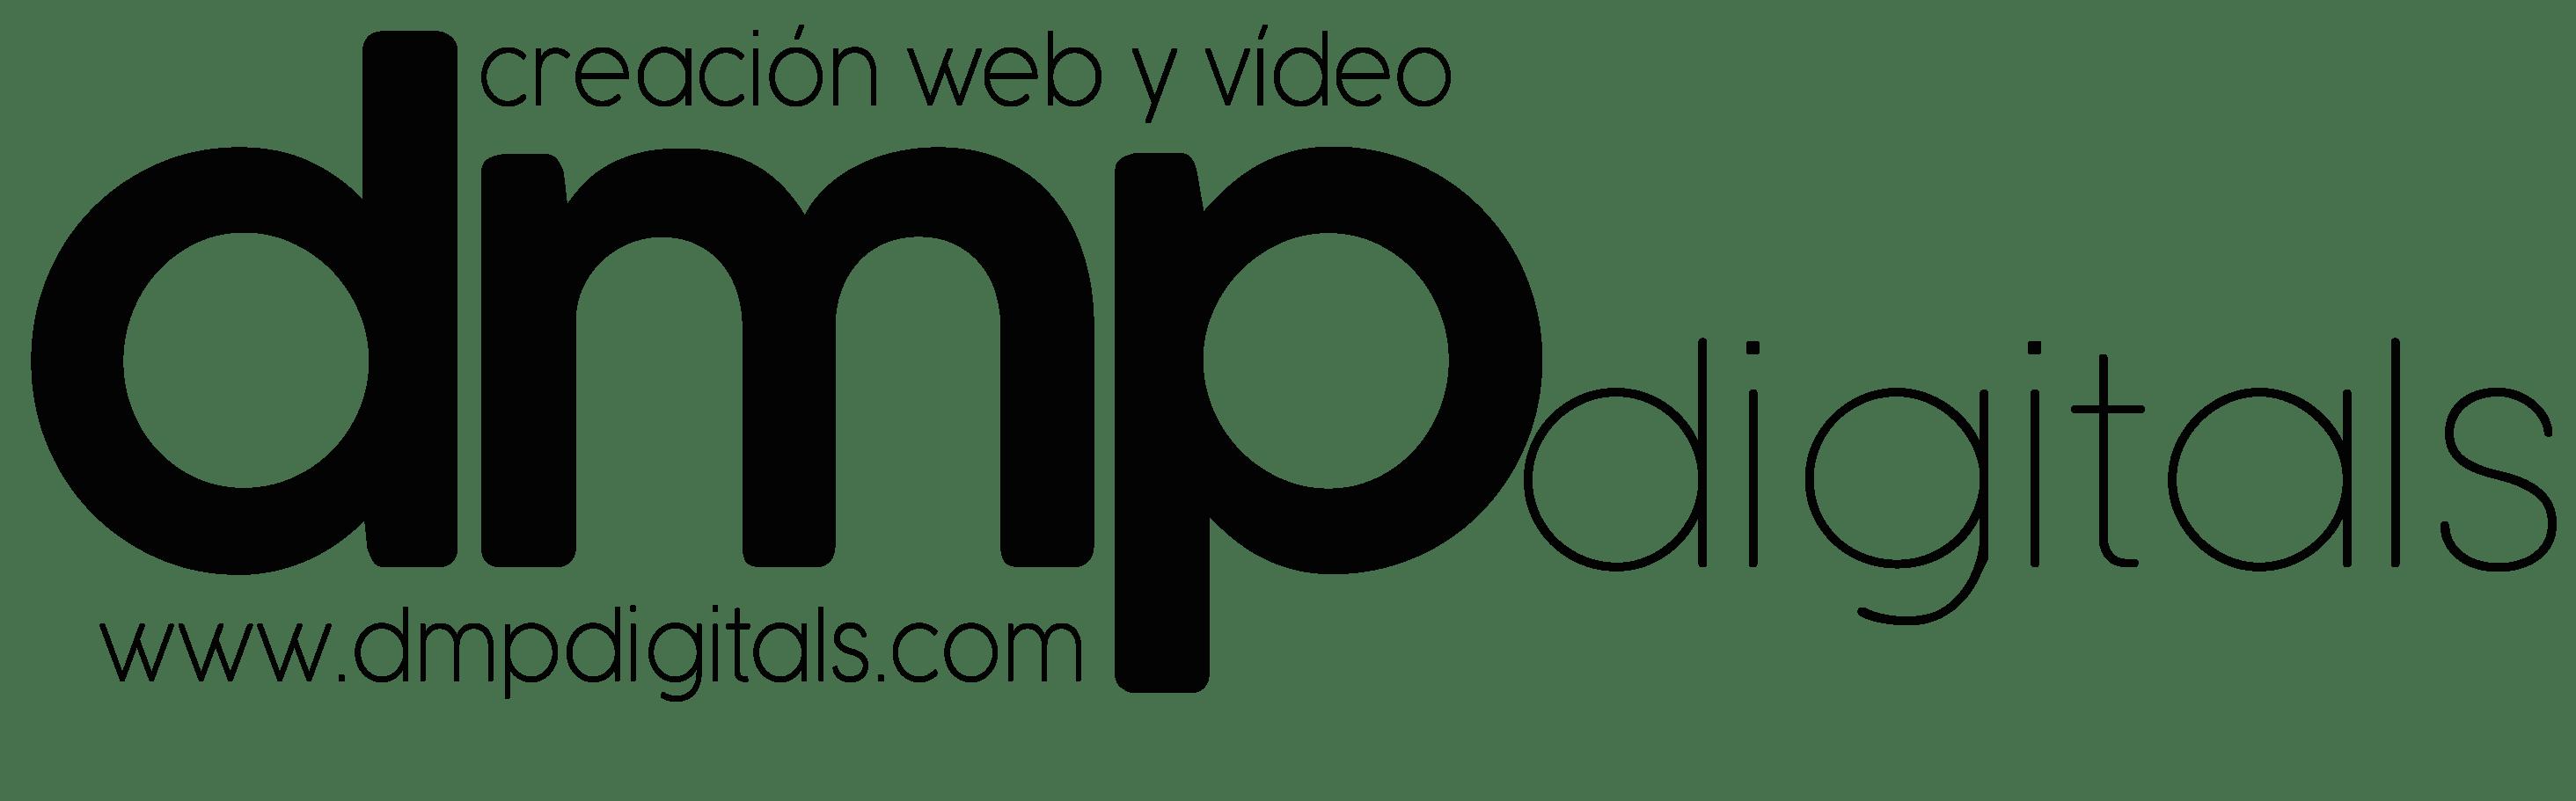 dmpdigitals logo